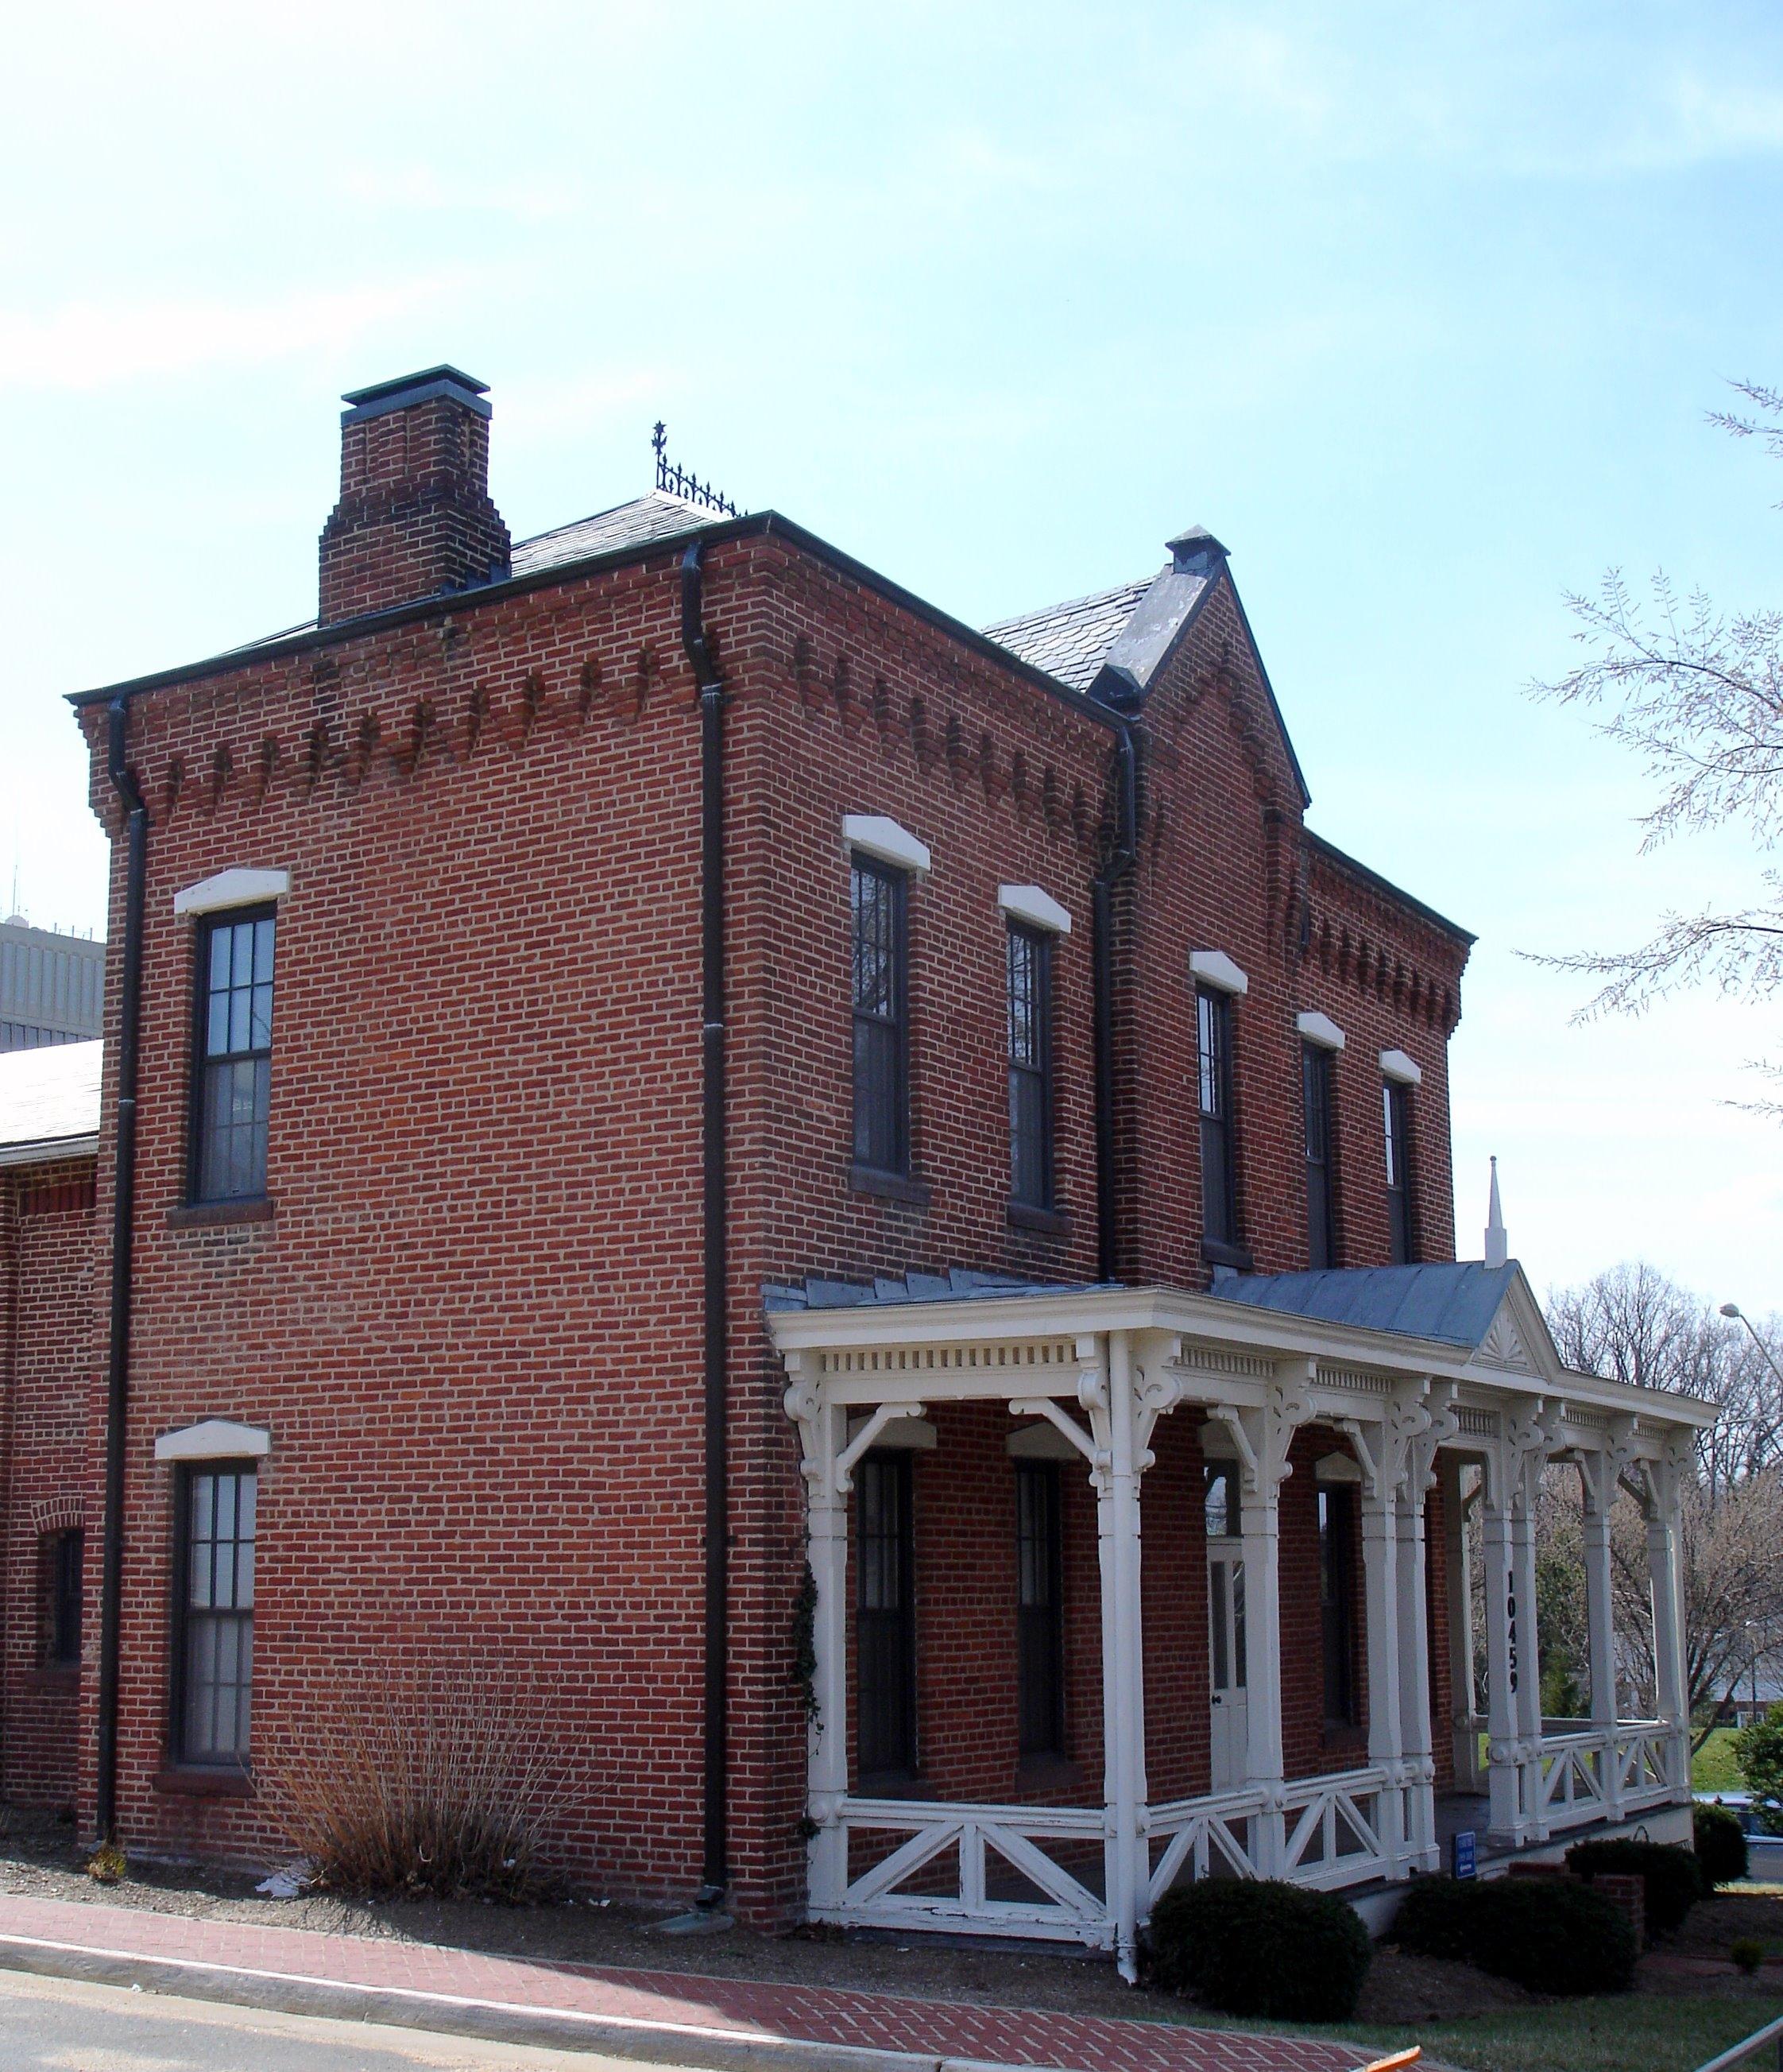 The Historic Fairfax County Jail